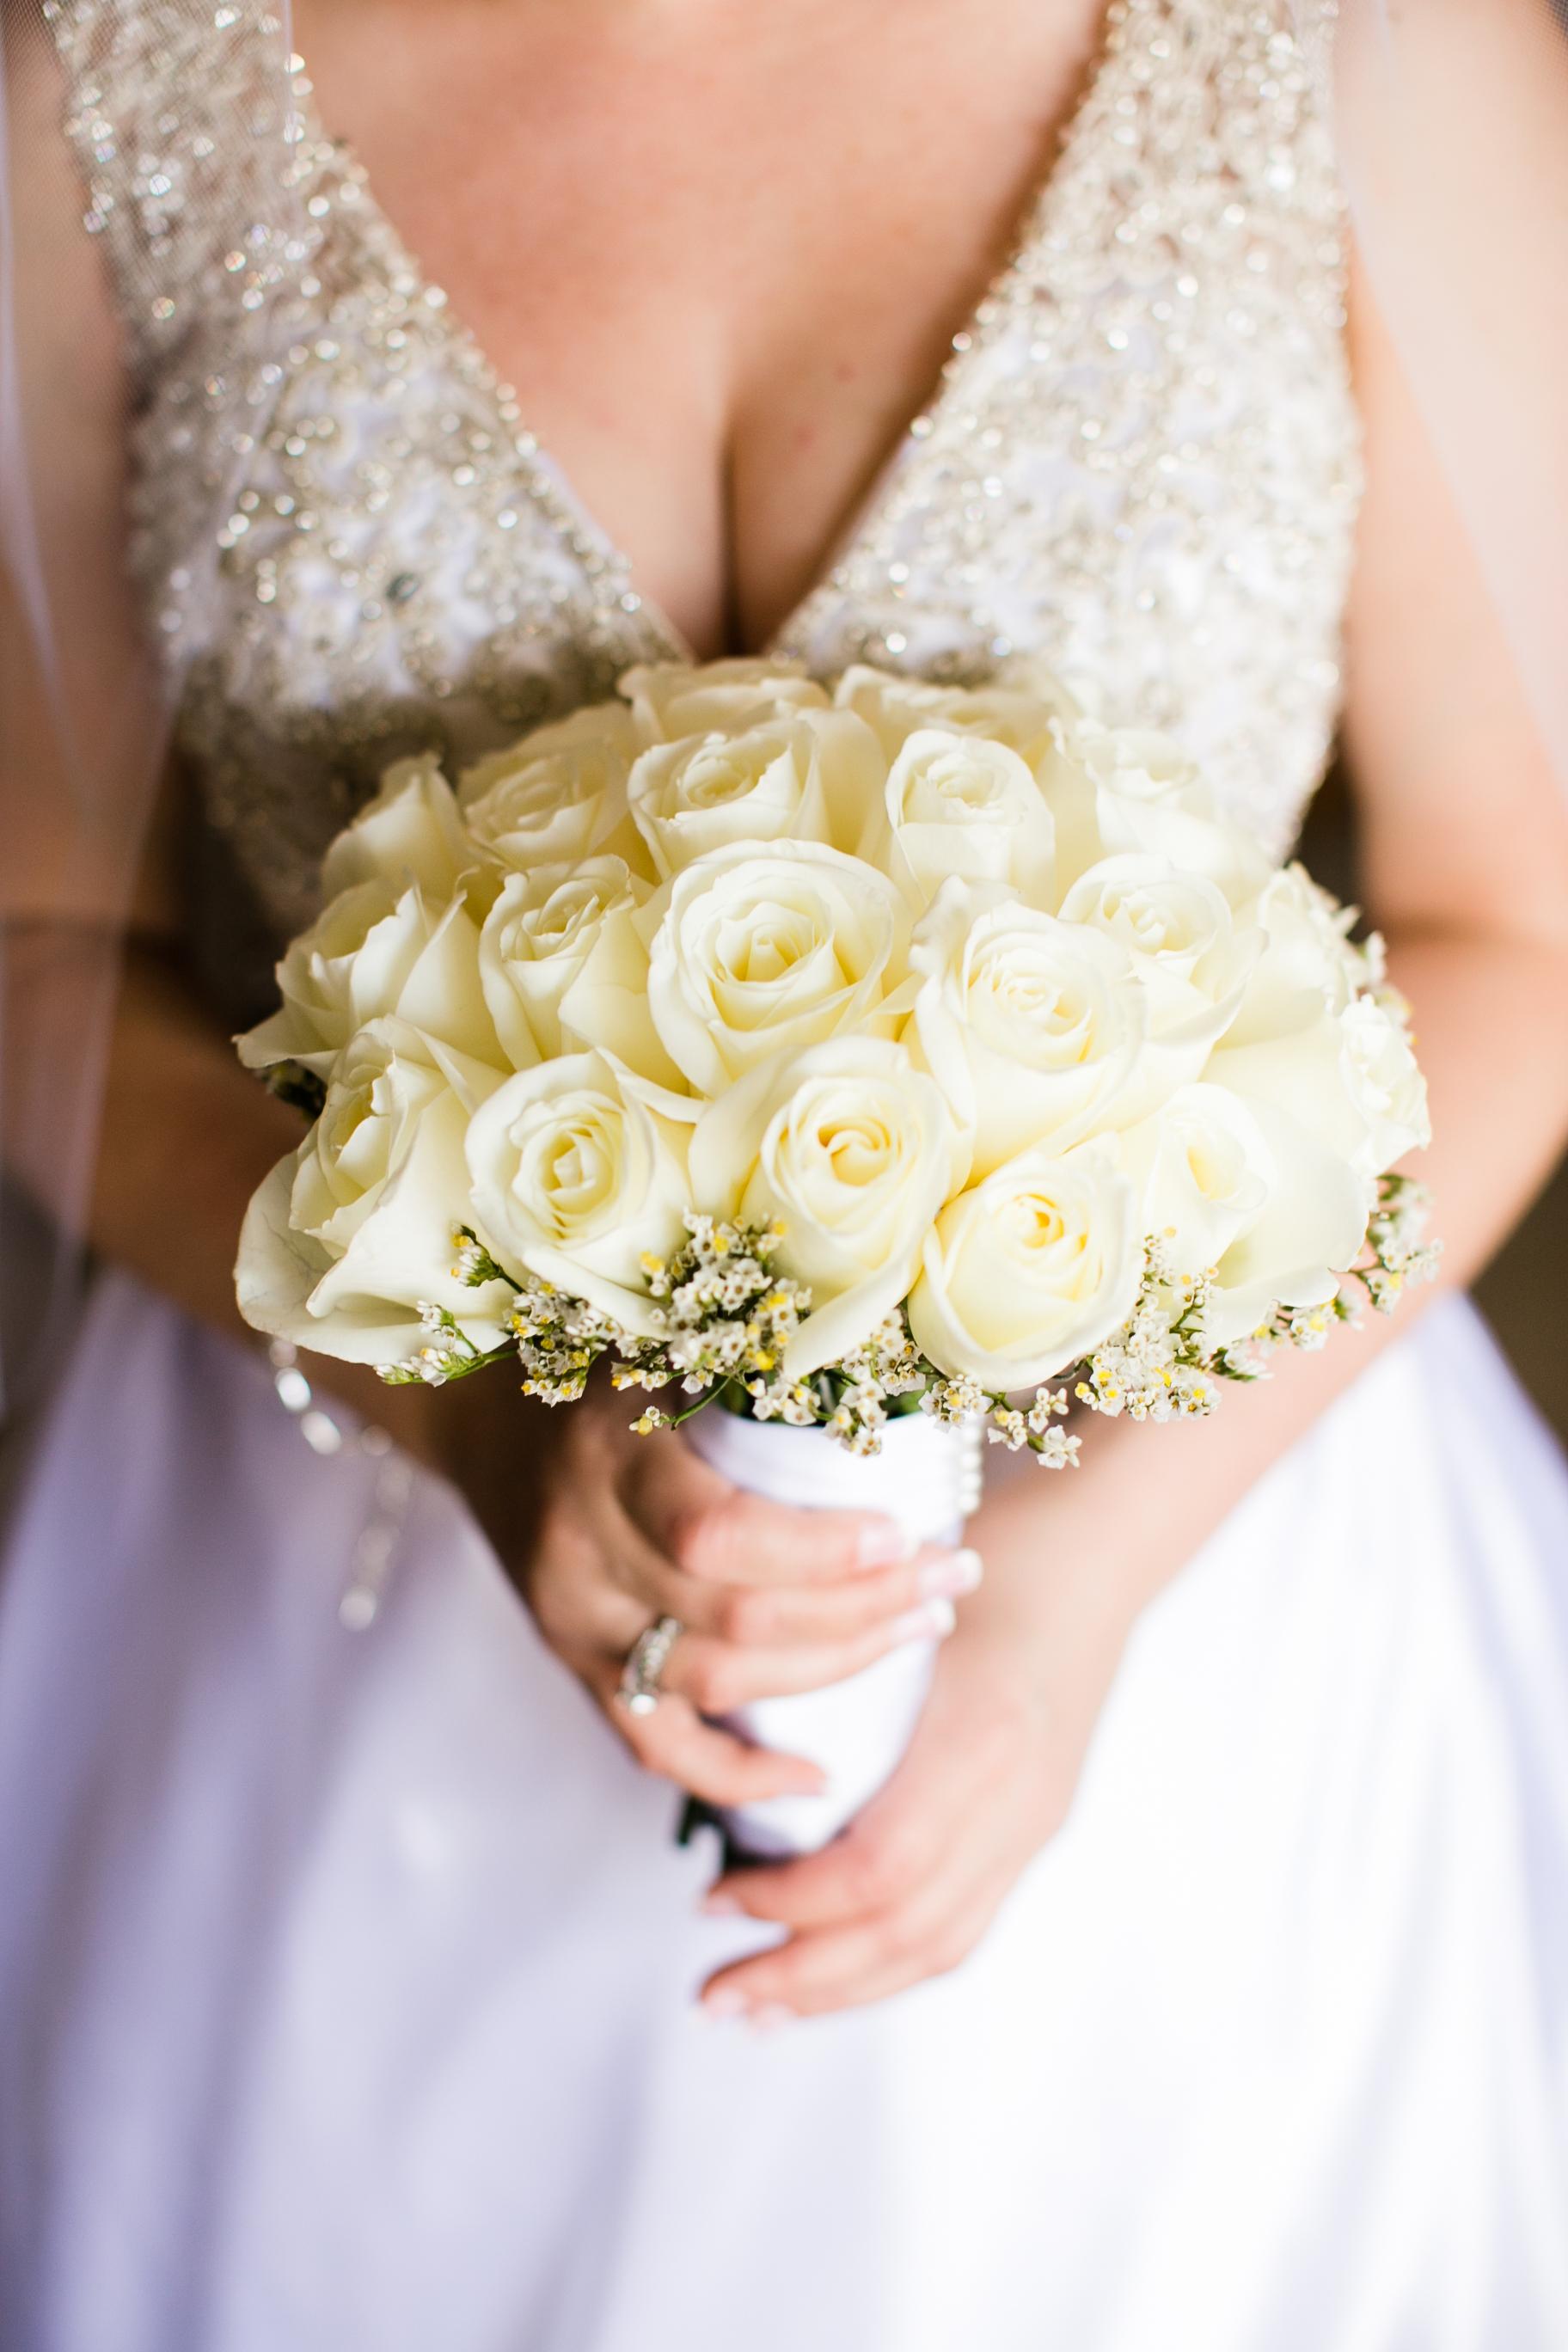 BENSALEM COUNTRY CLUB WEDDING PHOTOGRAPHY - 029.jpg